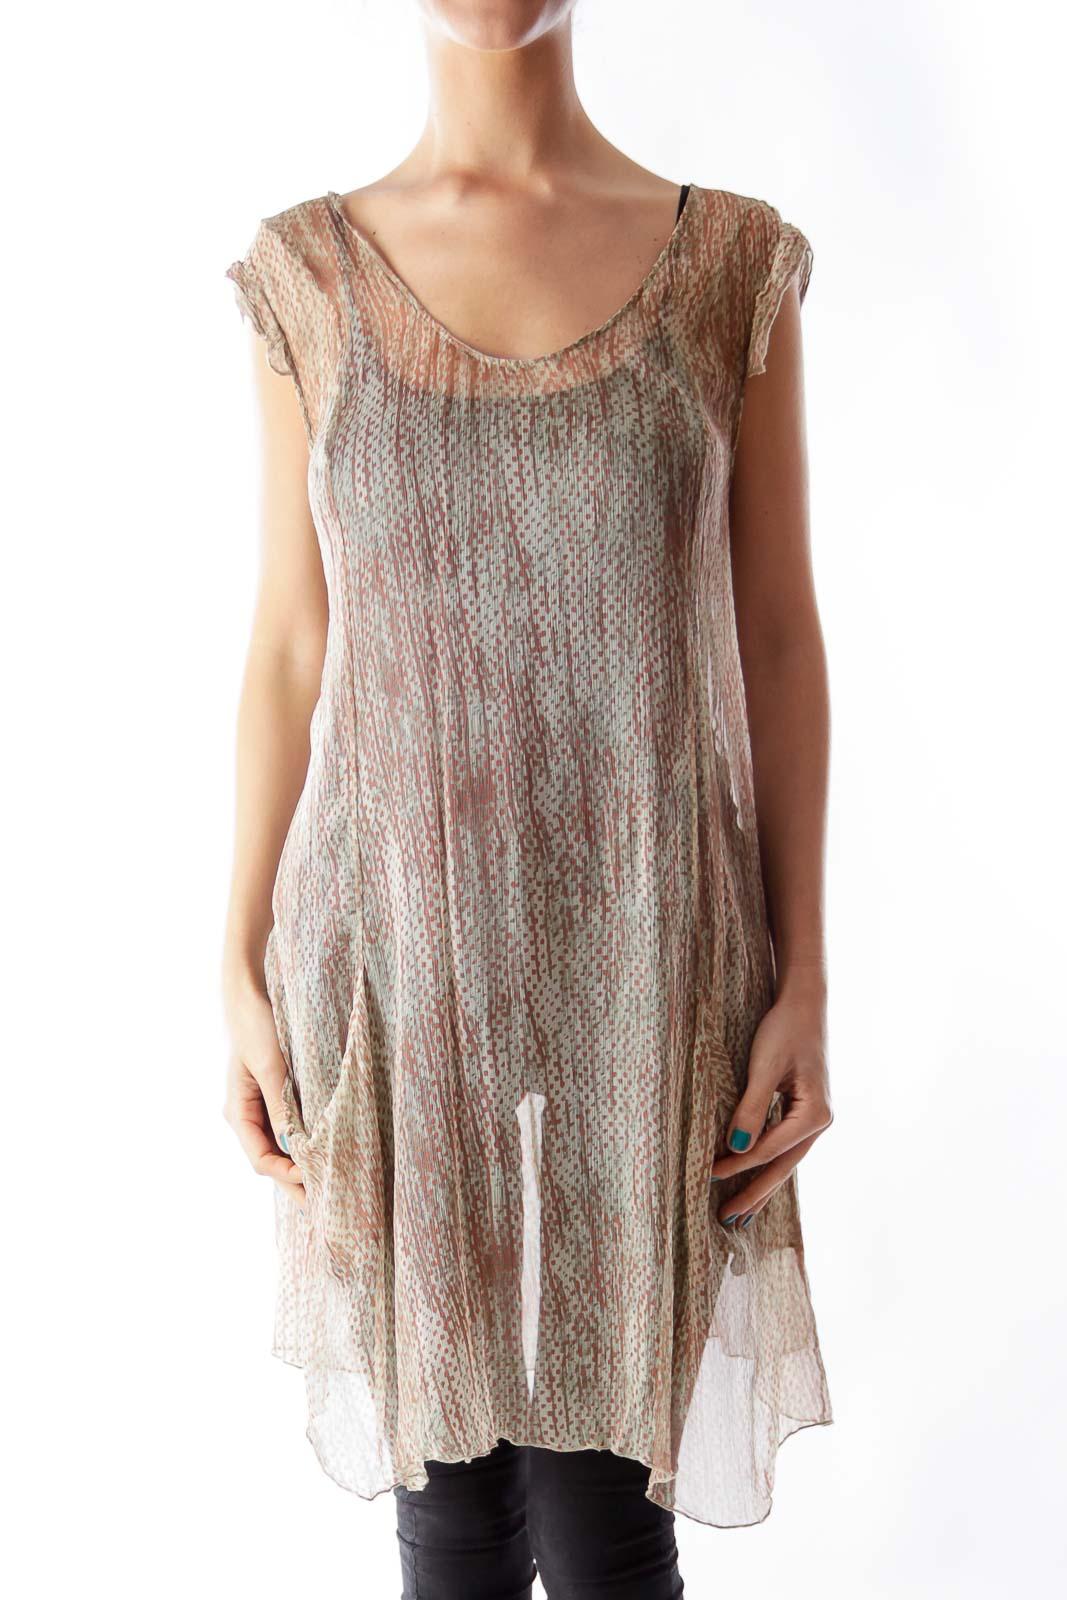 Beige Print See Through Dress Front